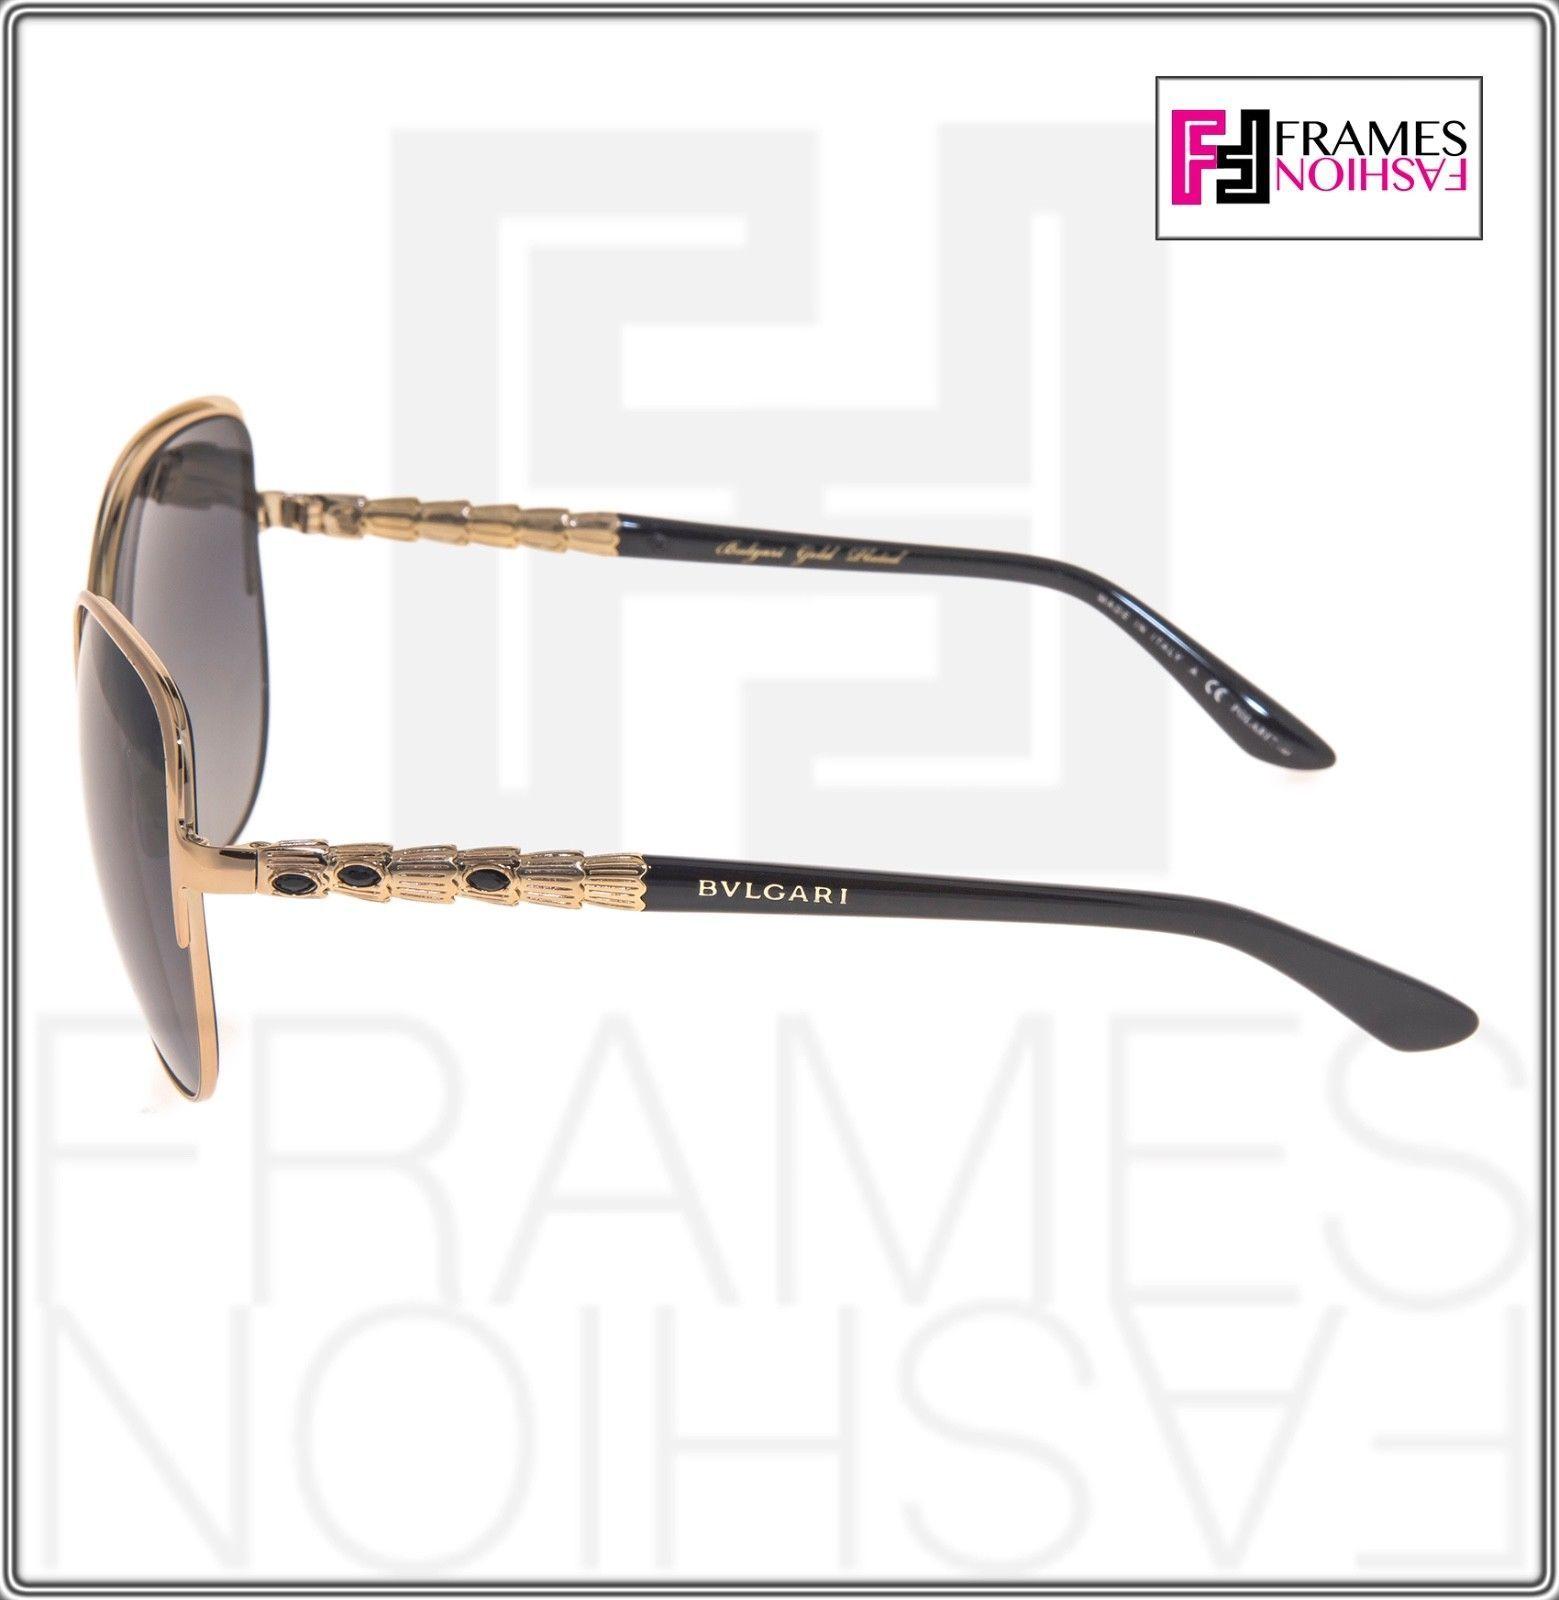 BVLGARI Le Gemme BV6078KB Black Gold 18K Plated POLARIZED Sunglasses 6078 Women image 2